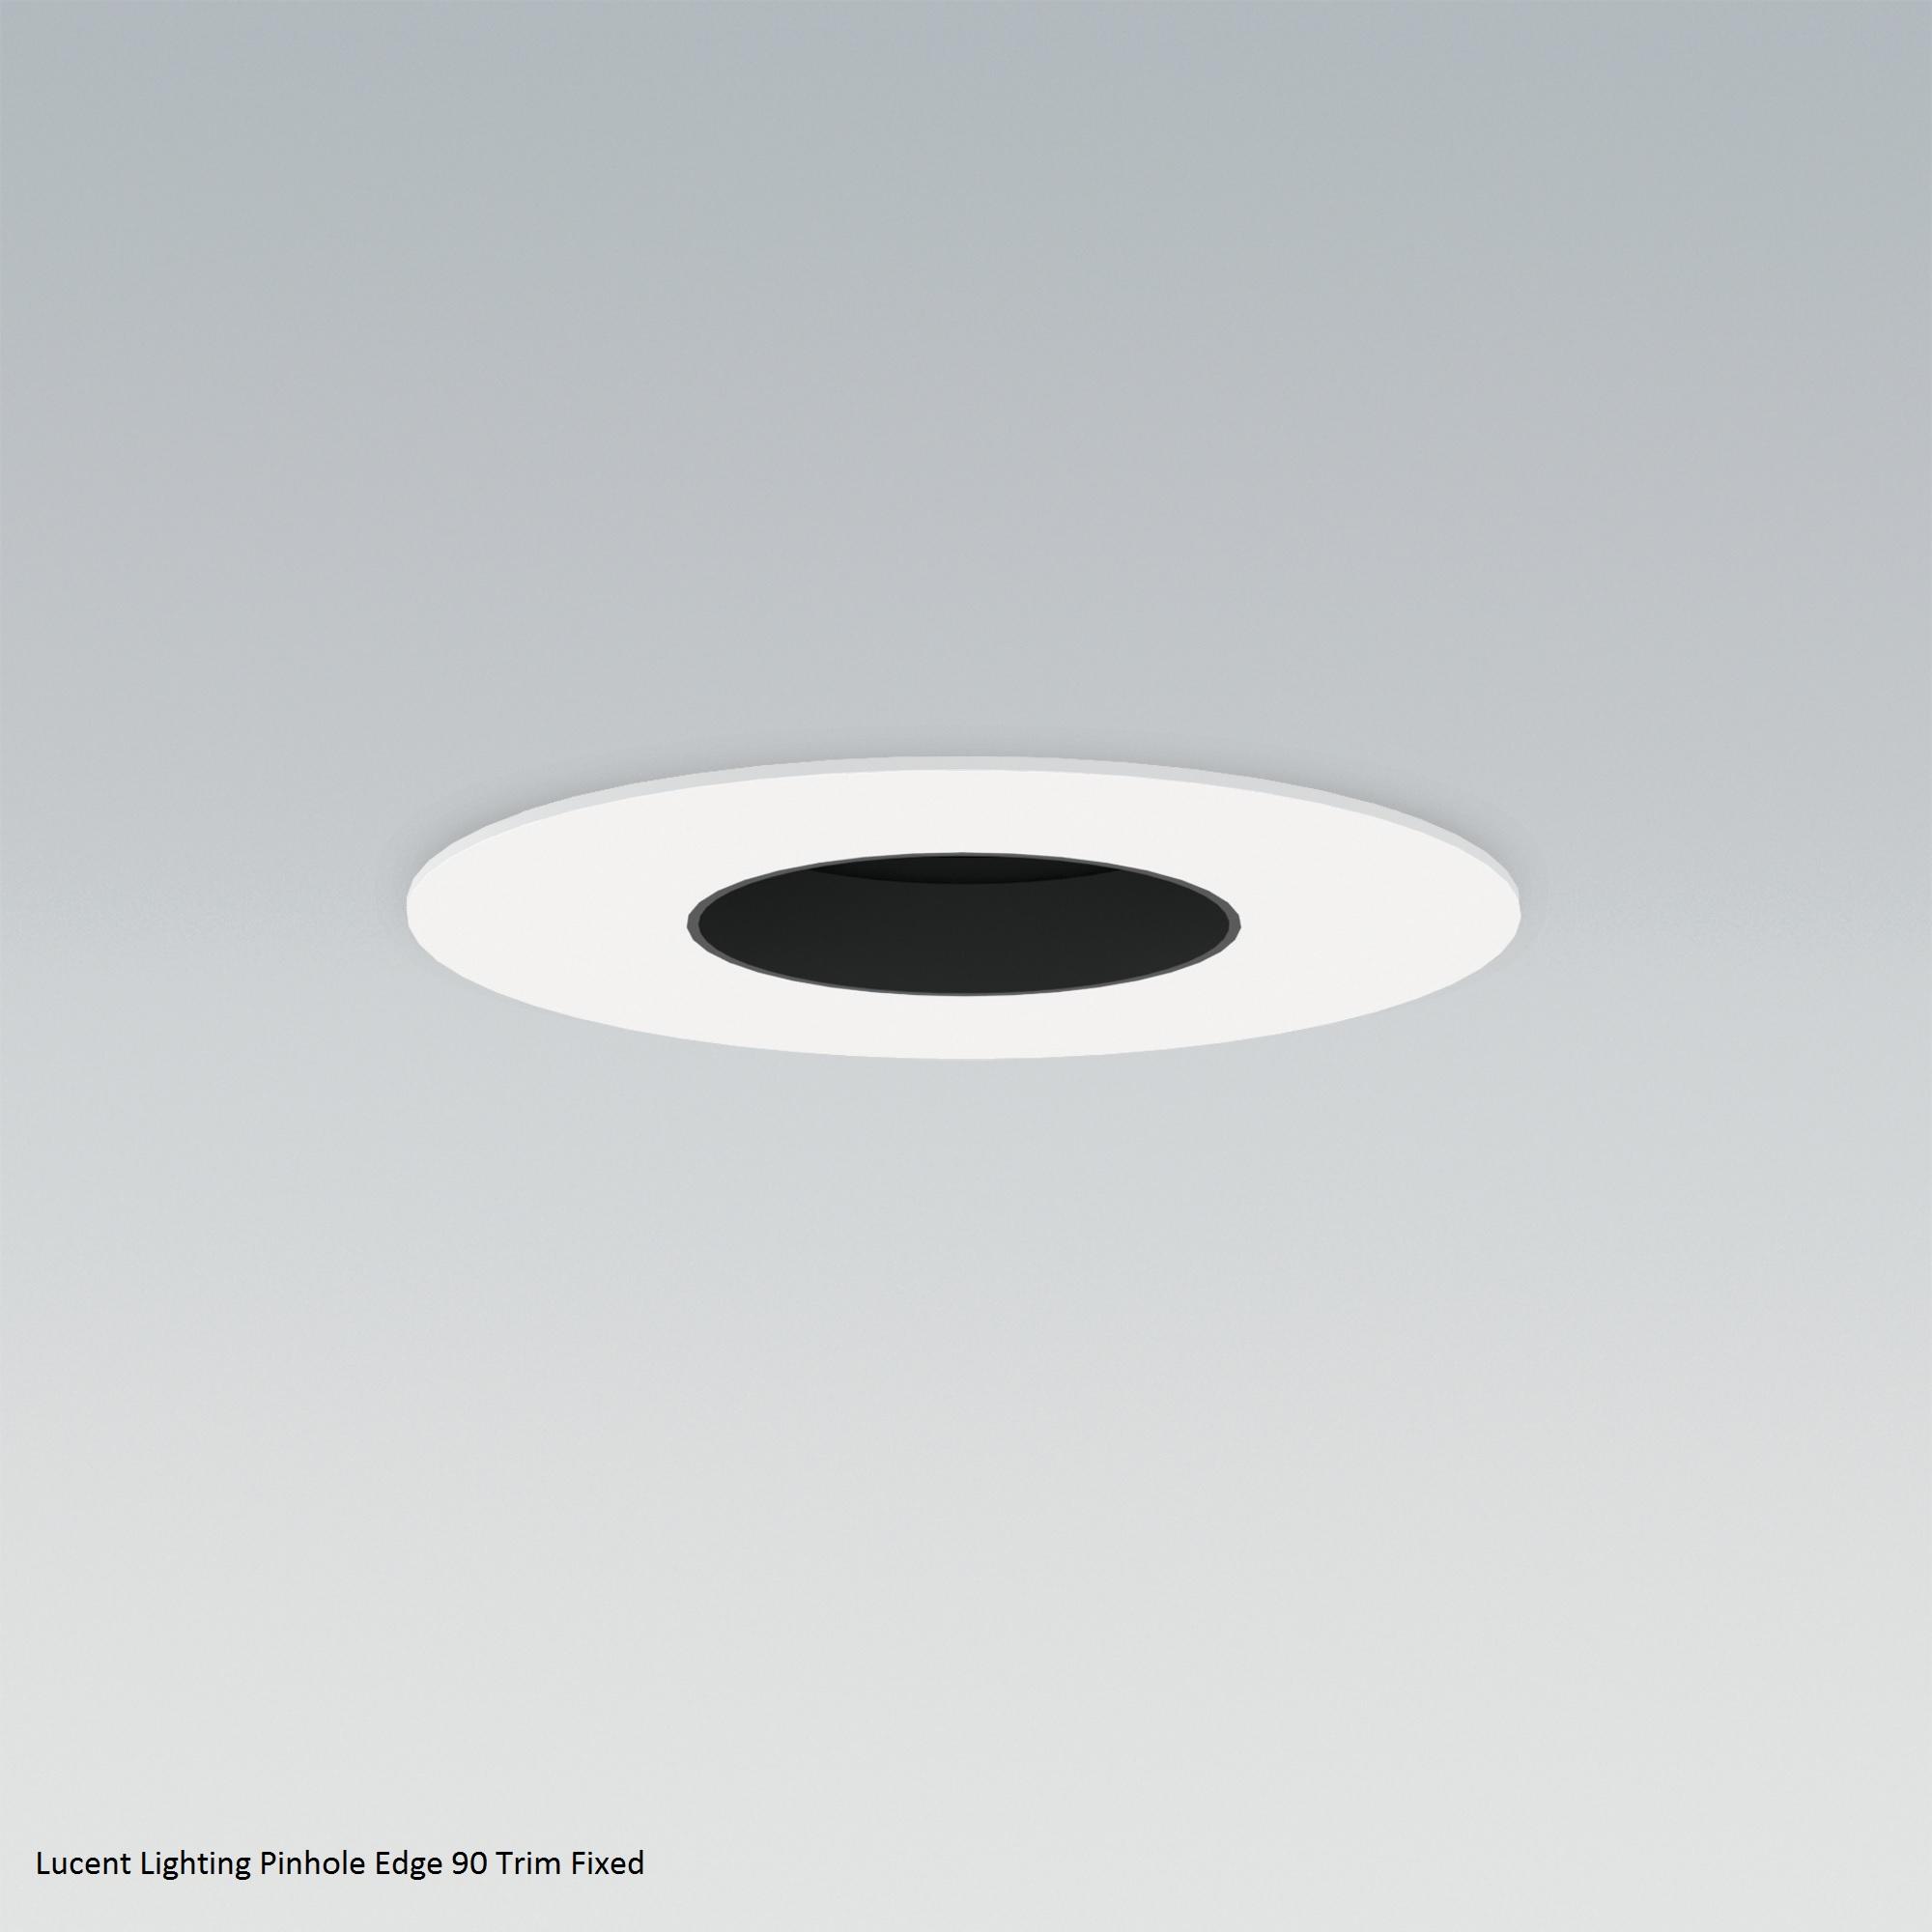 Lucent Lighting Pinhole Edge pinhole Edge 90 Trim Fixed